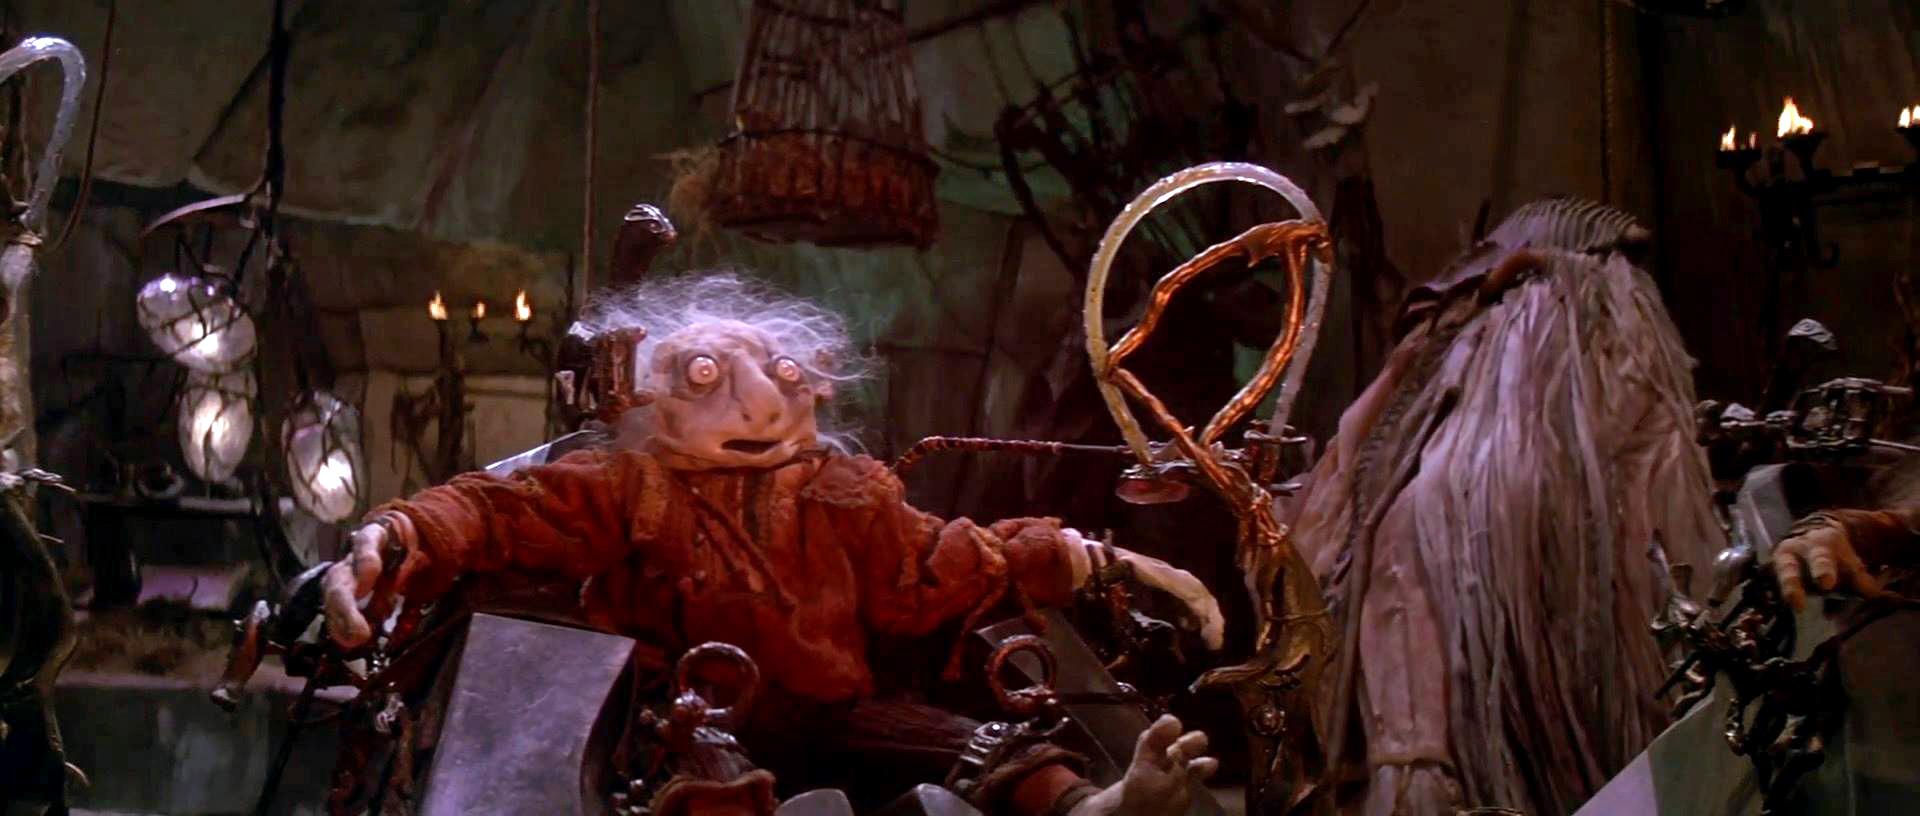 Podling, Dark Crystal, Jim Henson